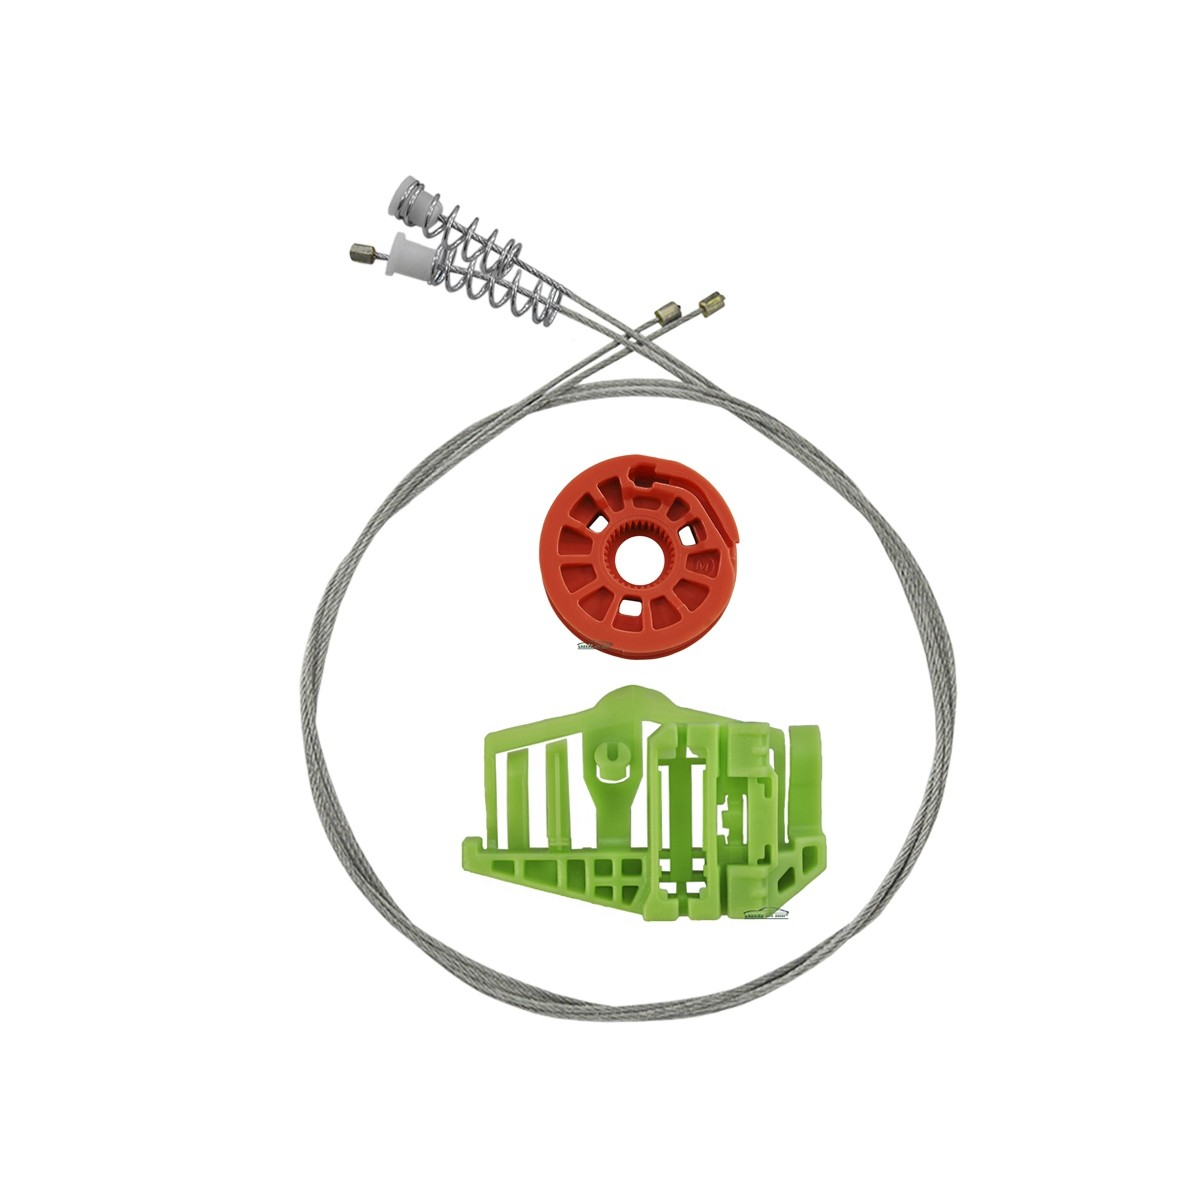 Kit Reparo Máquina de Vidro Elétrico Traseiro Bmw X1  4 Portas Direito